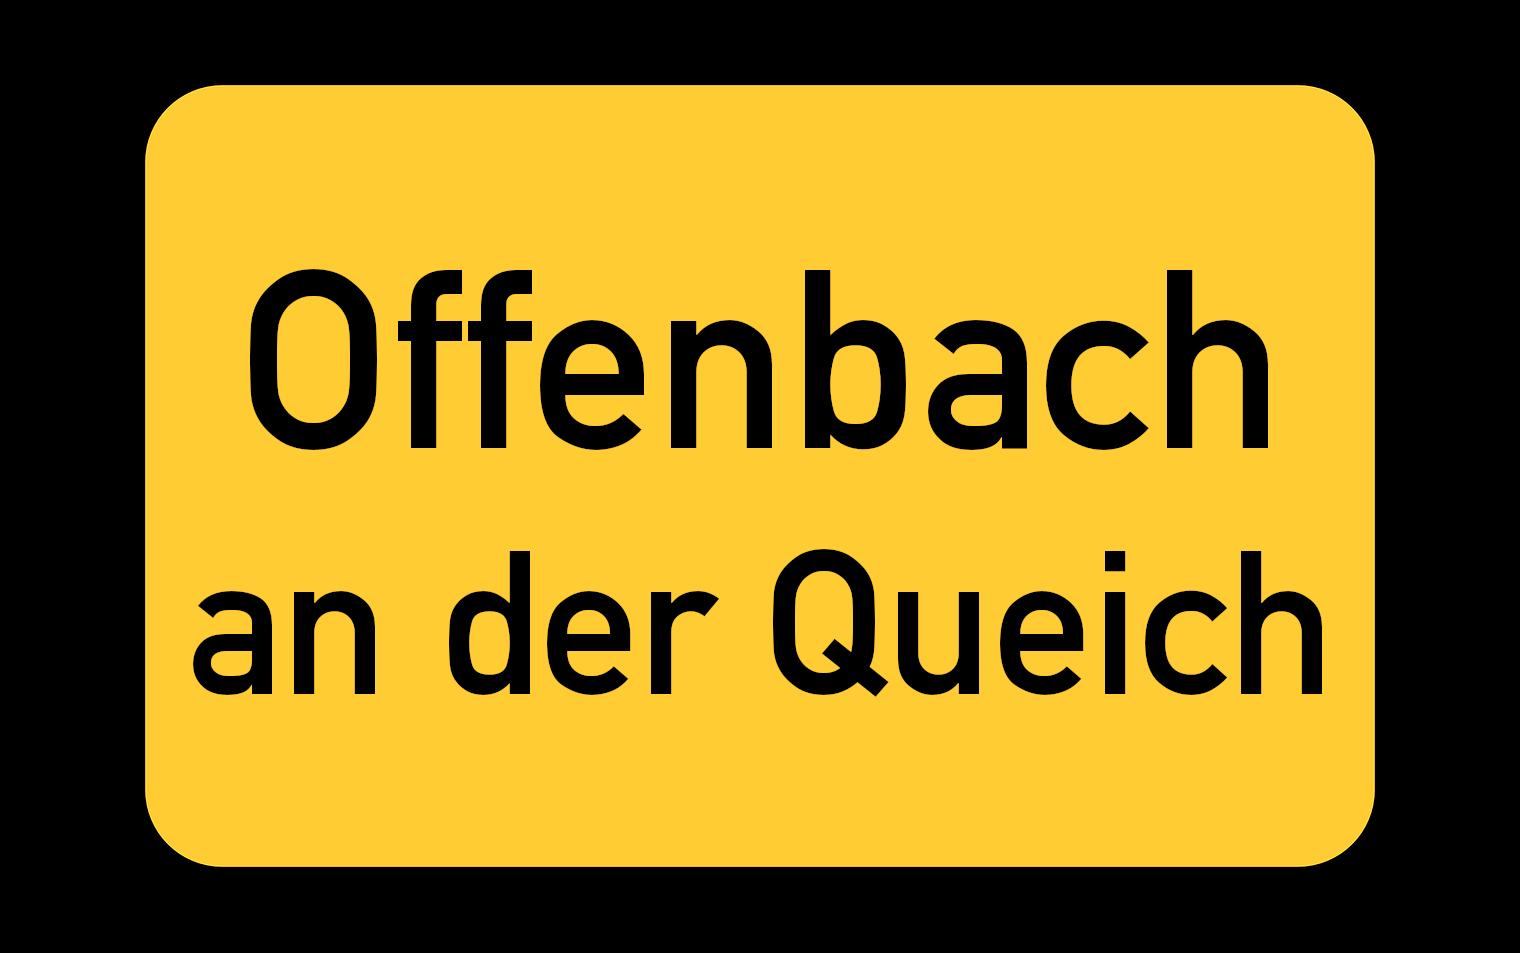 Isotox Schädlingsbekämpfung in Offenbach an der Queich